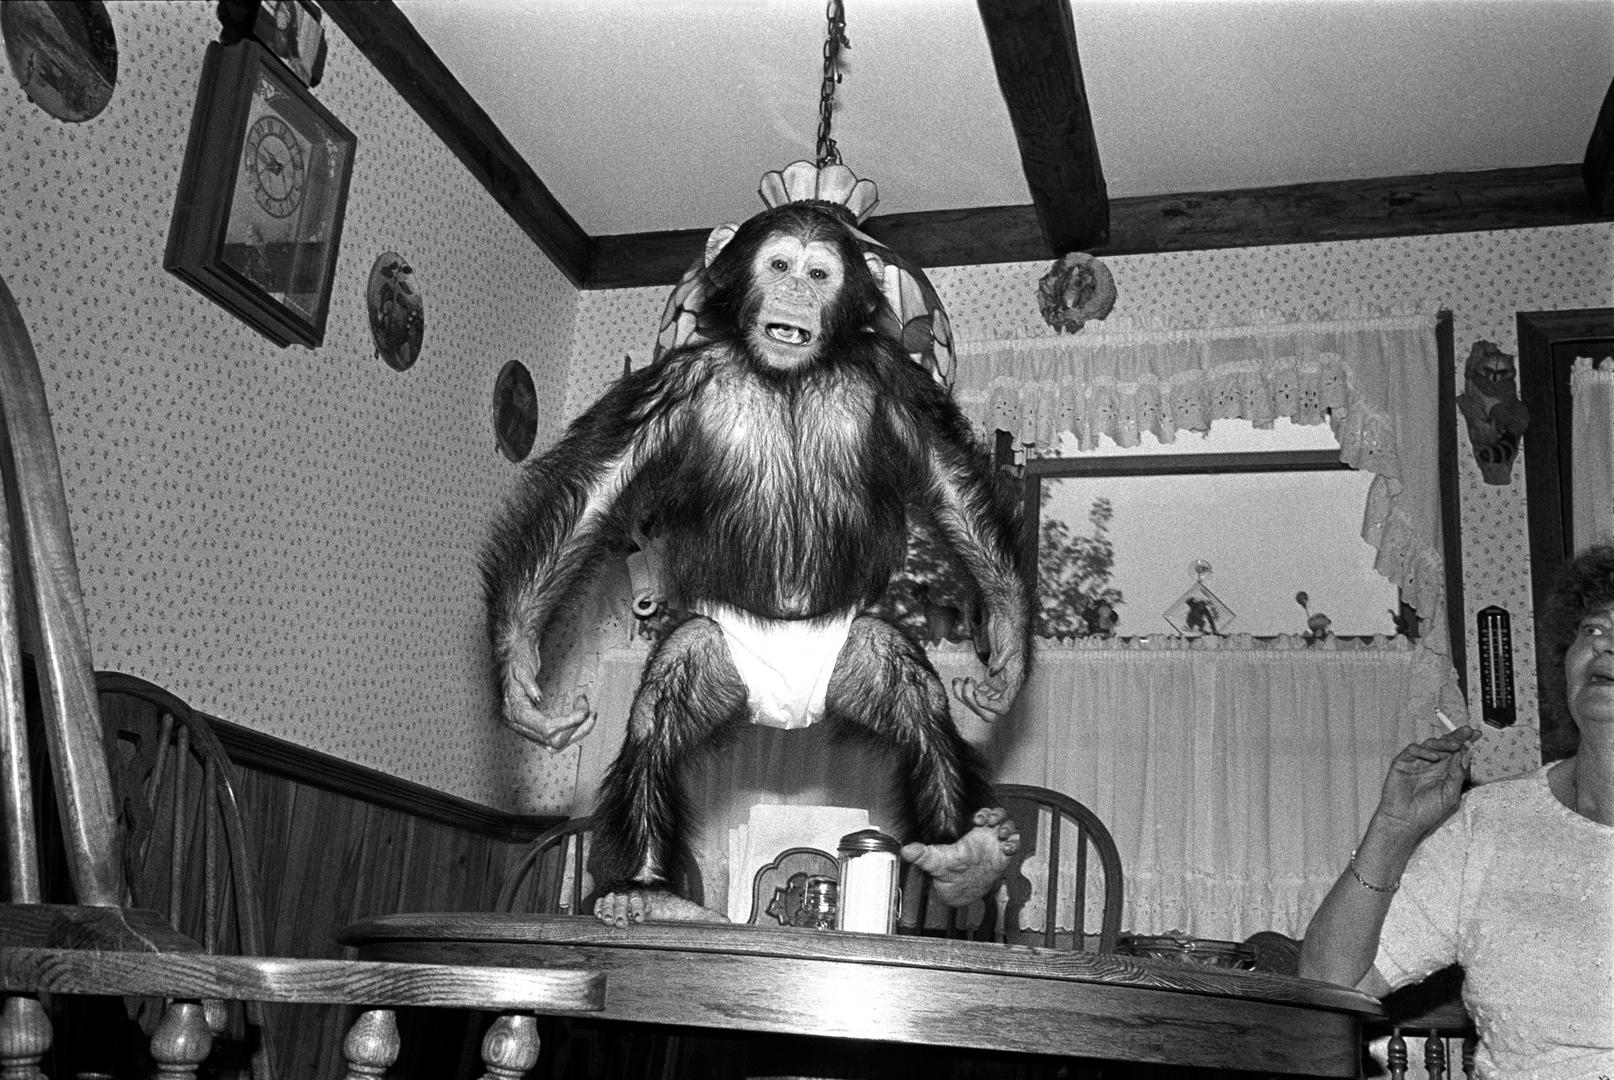 Maria, 1988. Chimpanzee, female, 2 years old.